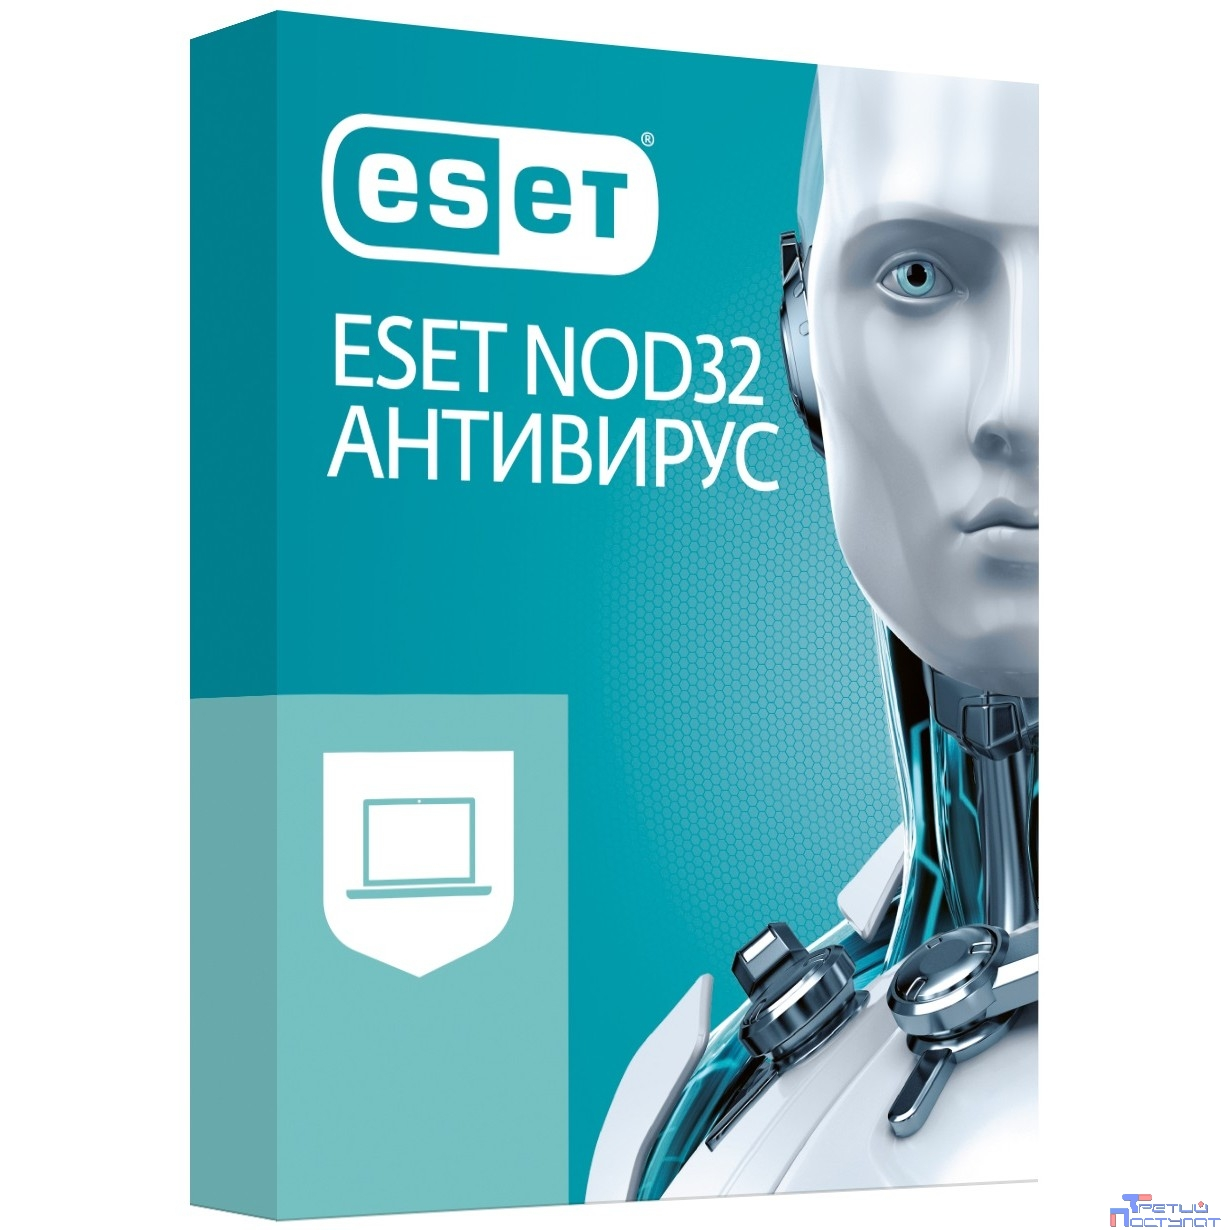 NOD32-ENA-2012RN(BOX)-1-1 ESET NOD32 Антивирус - продление на 20 месяцев или новая лицензия на 1 год на 3ПК